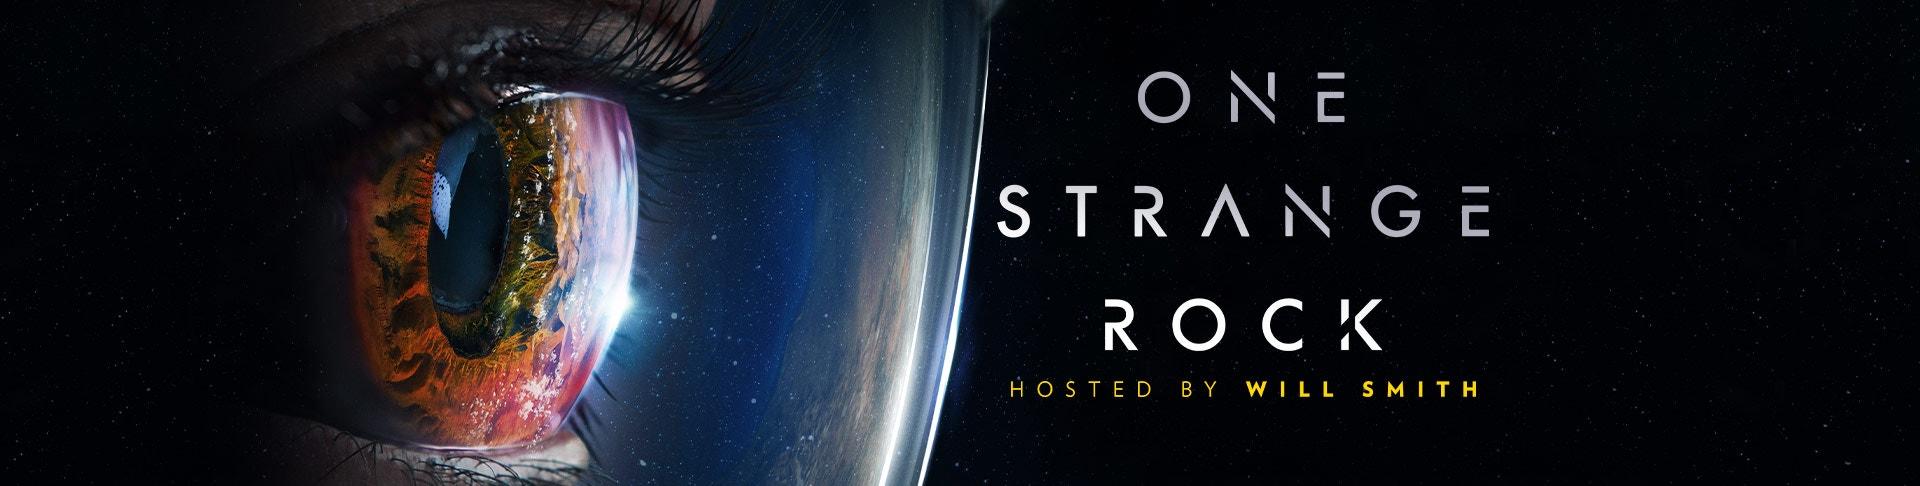 One Strange Rock - S1 Ep  1 - Network Ten